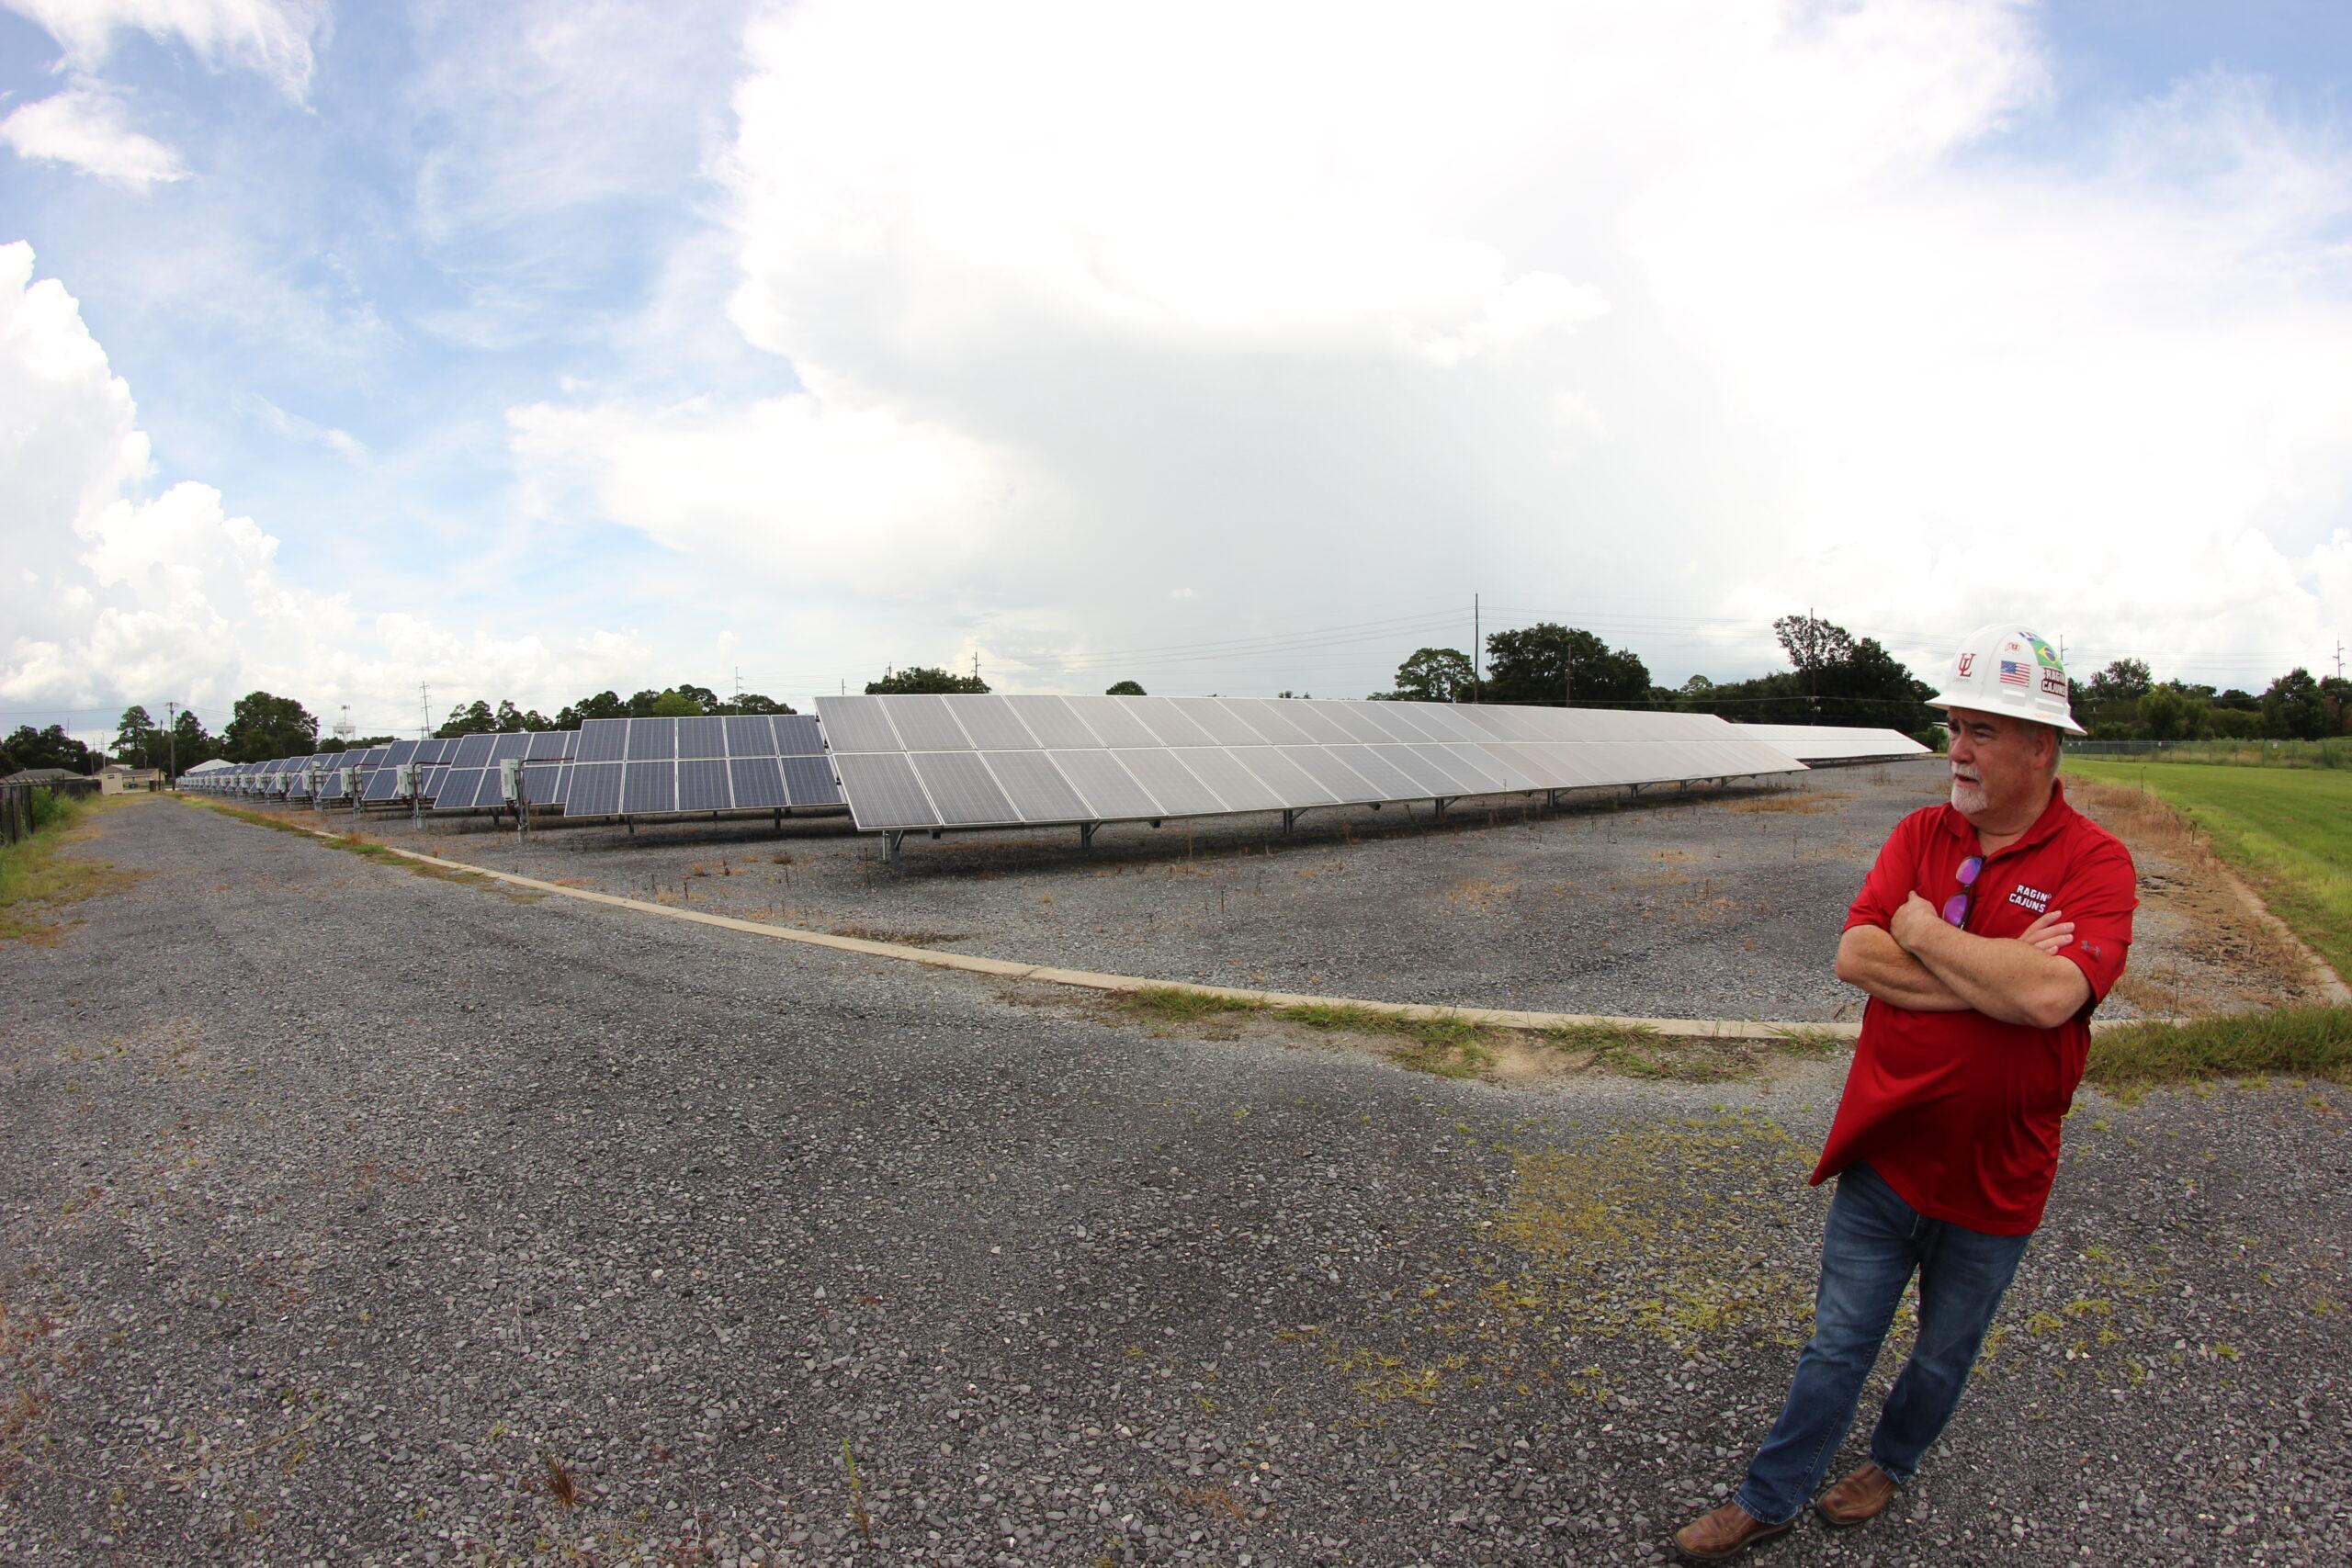 University of Louisiana at Lafayette studies solar farming despite pushback to renewable energy